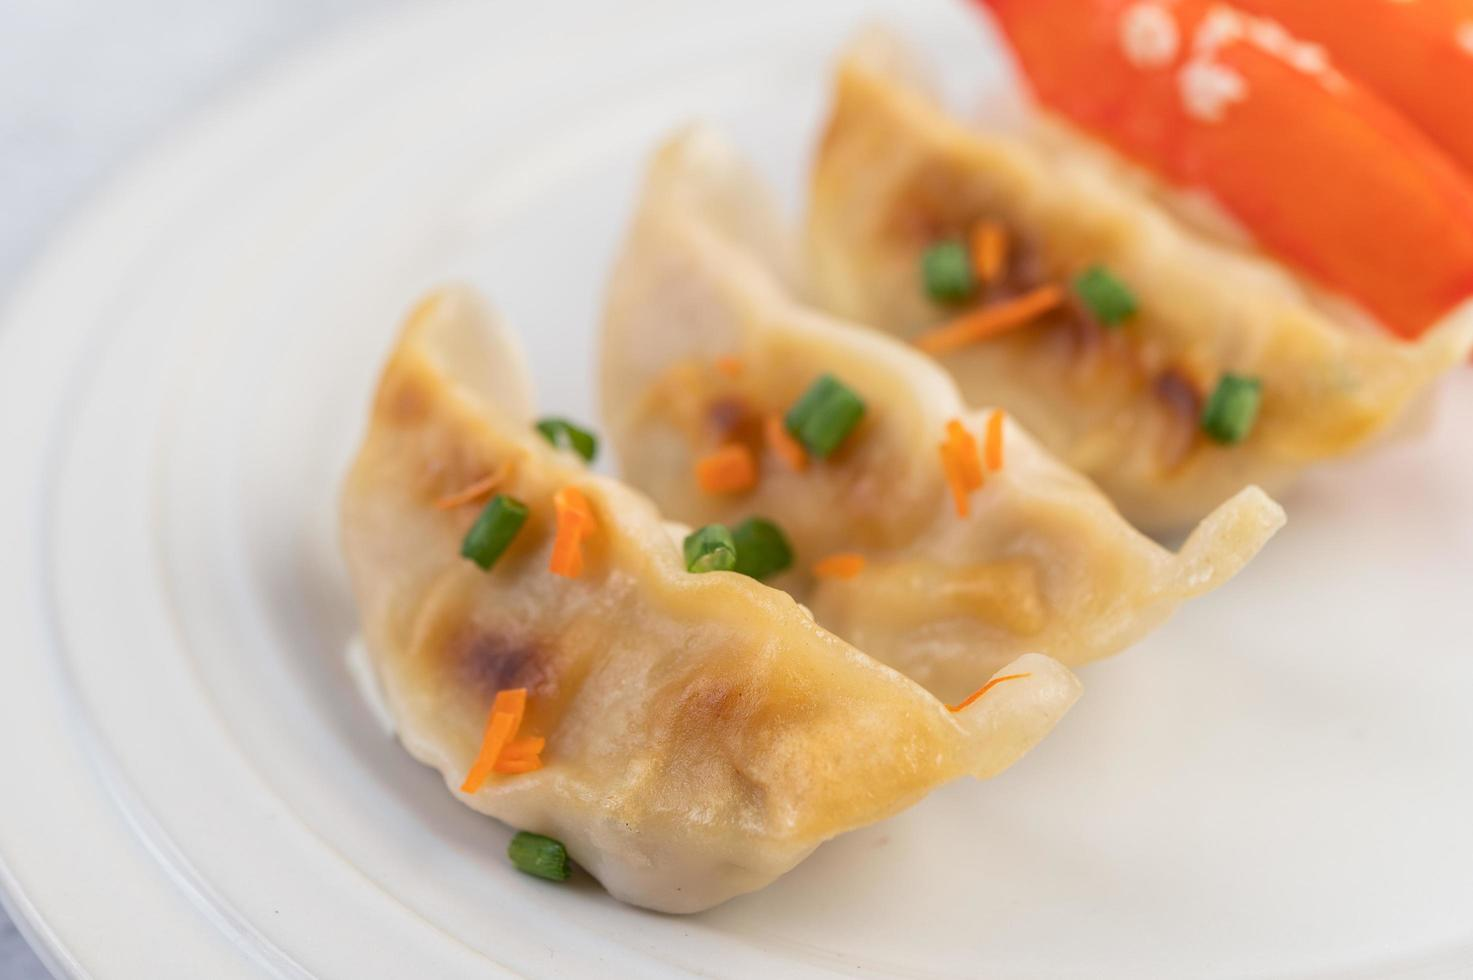 Traditional gyoza dumplings photo